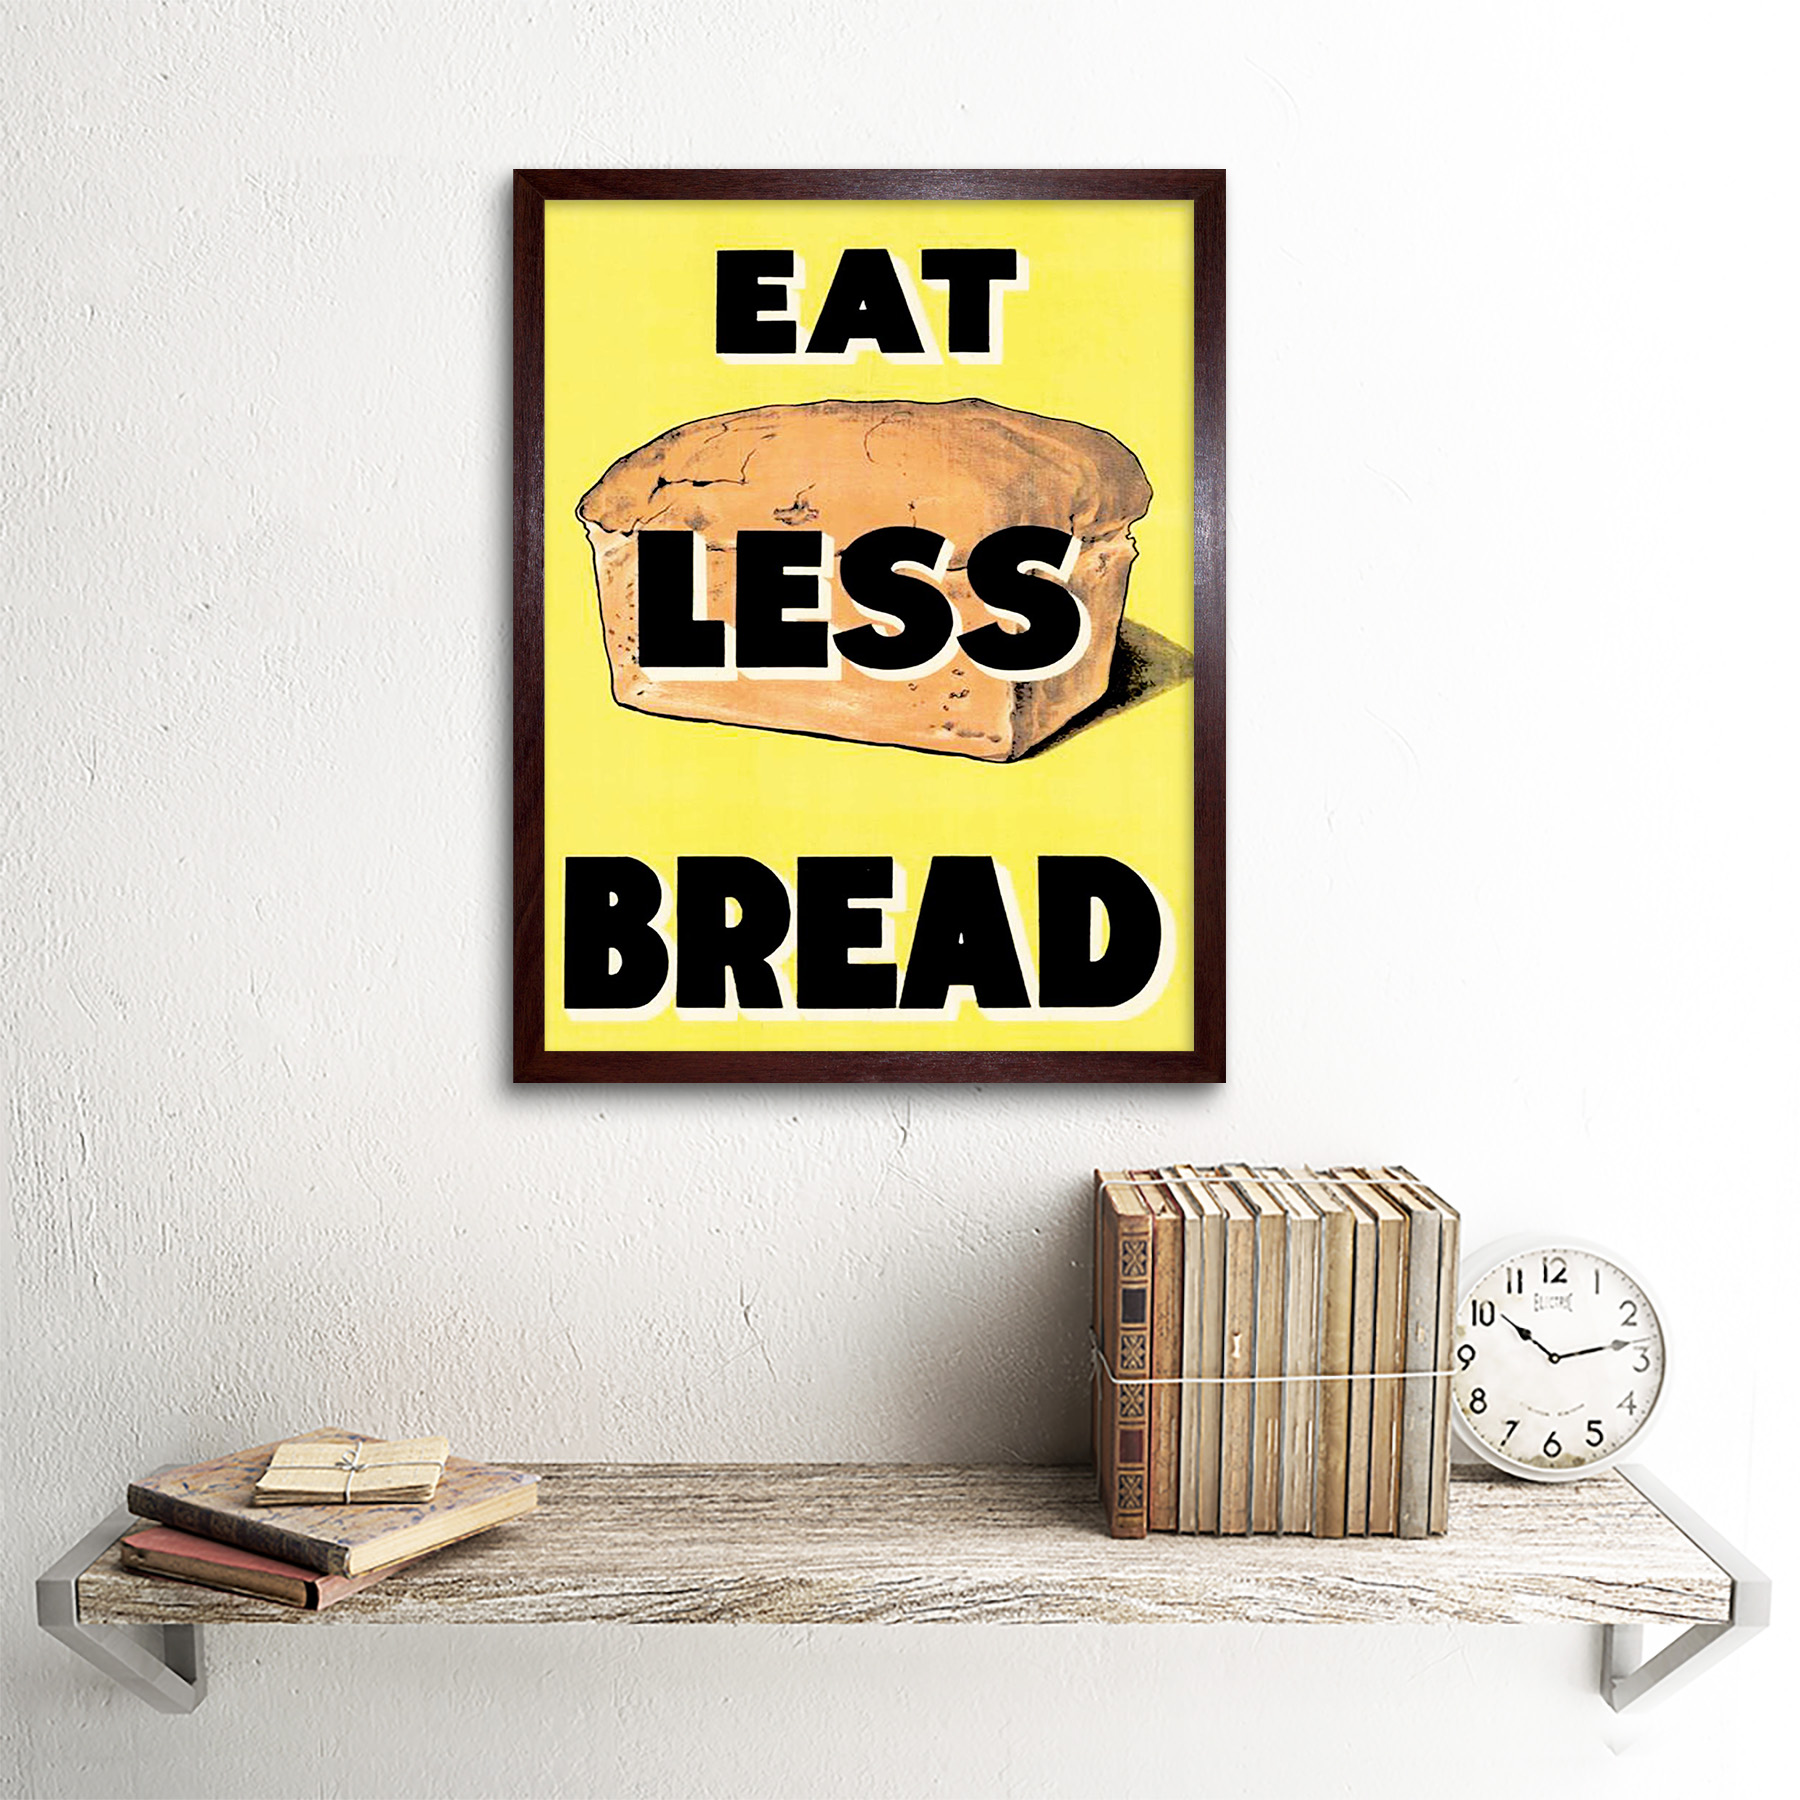 Propaganda War Wwii Uk Eat Less Bread Loaf Ration Food 12X16 Inch Framed Print